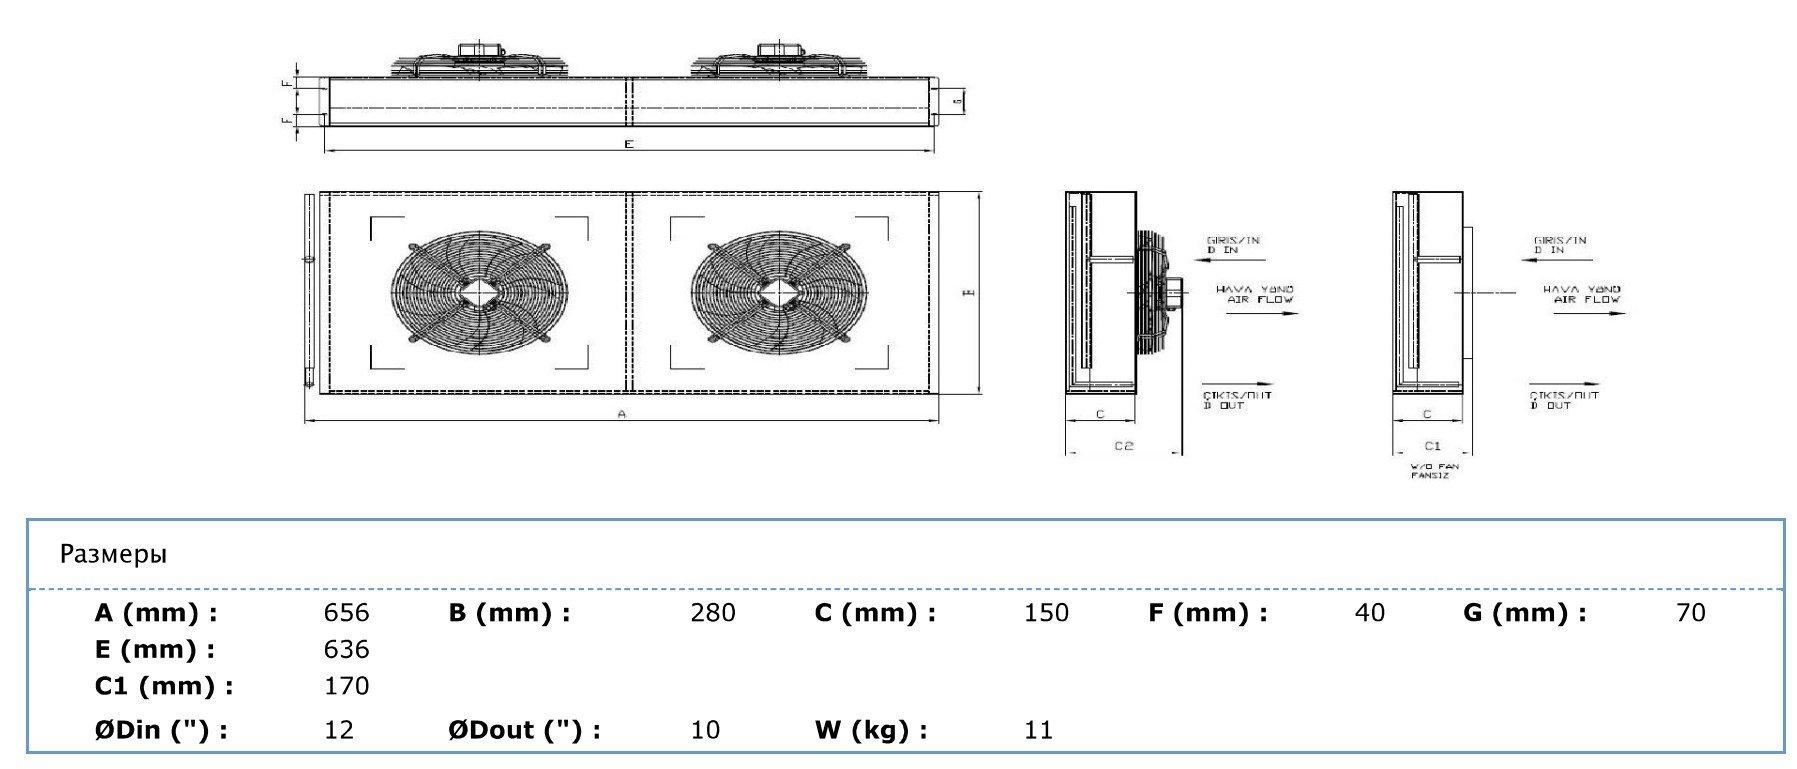 Габаритный чертеж конденсатор Karyer KT 225 AC4-B05